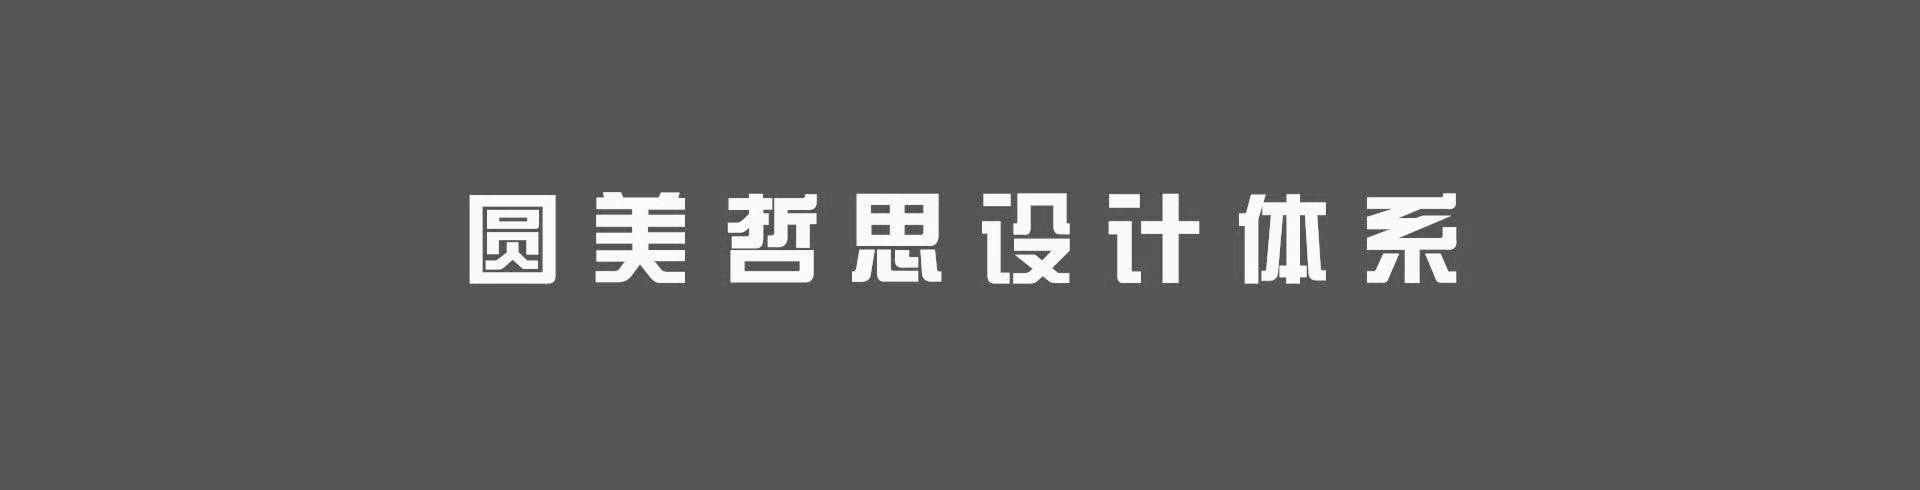 QQ图片20190307195908_副本.jpg